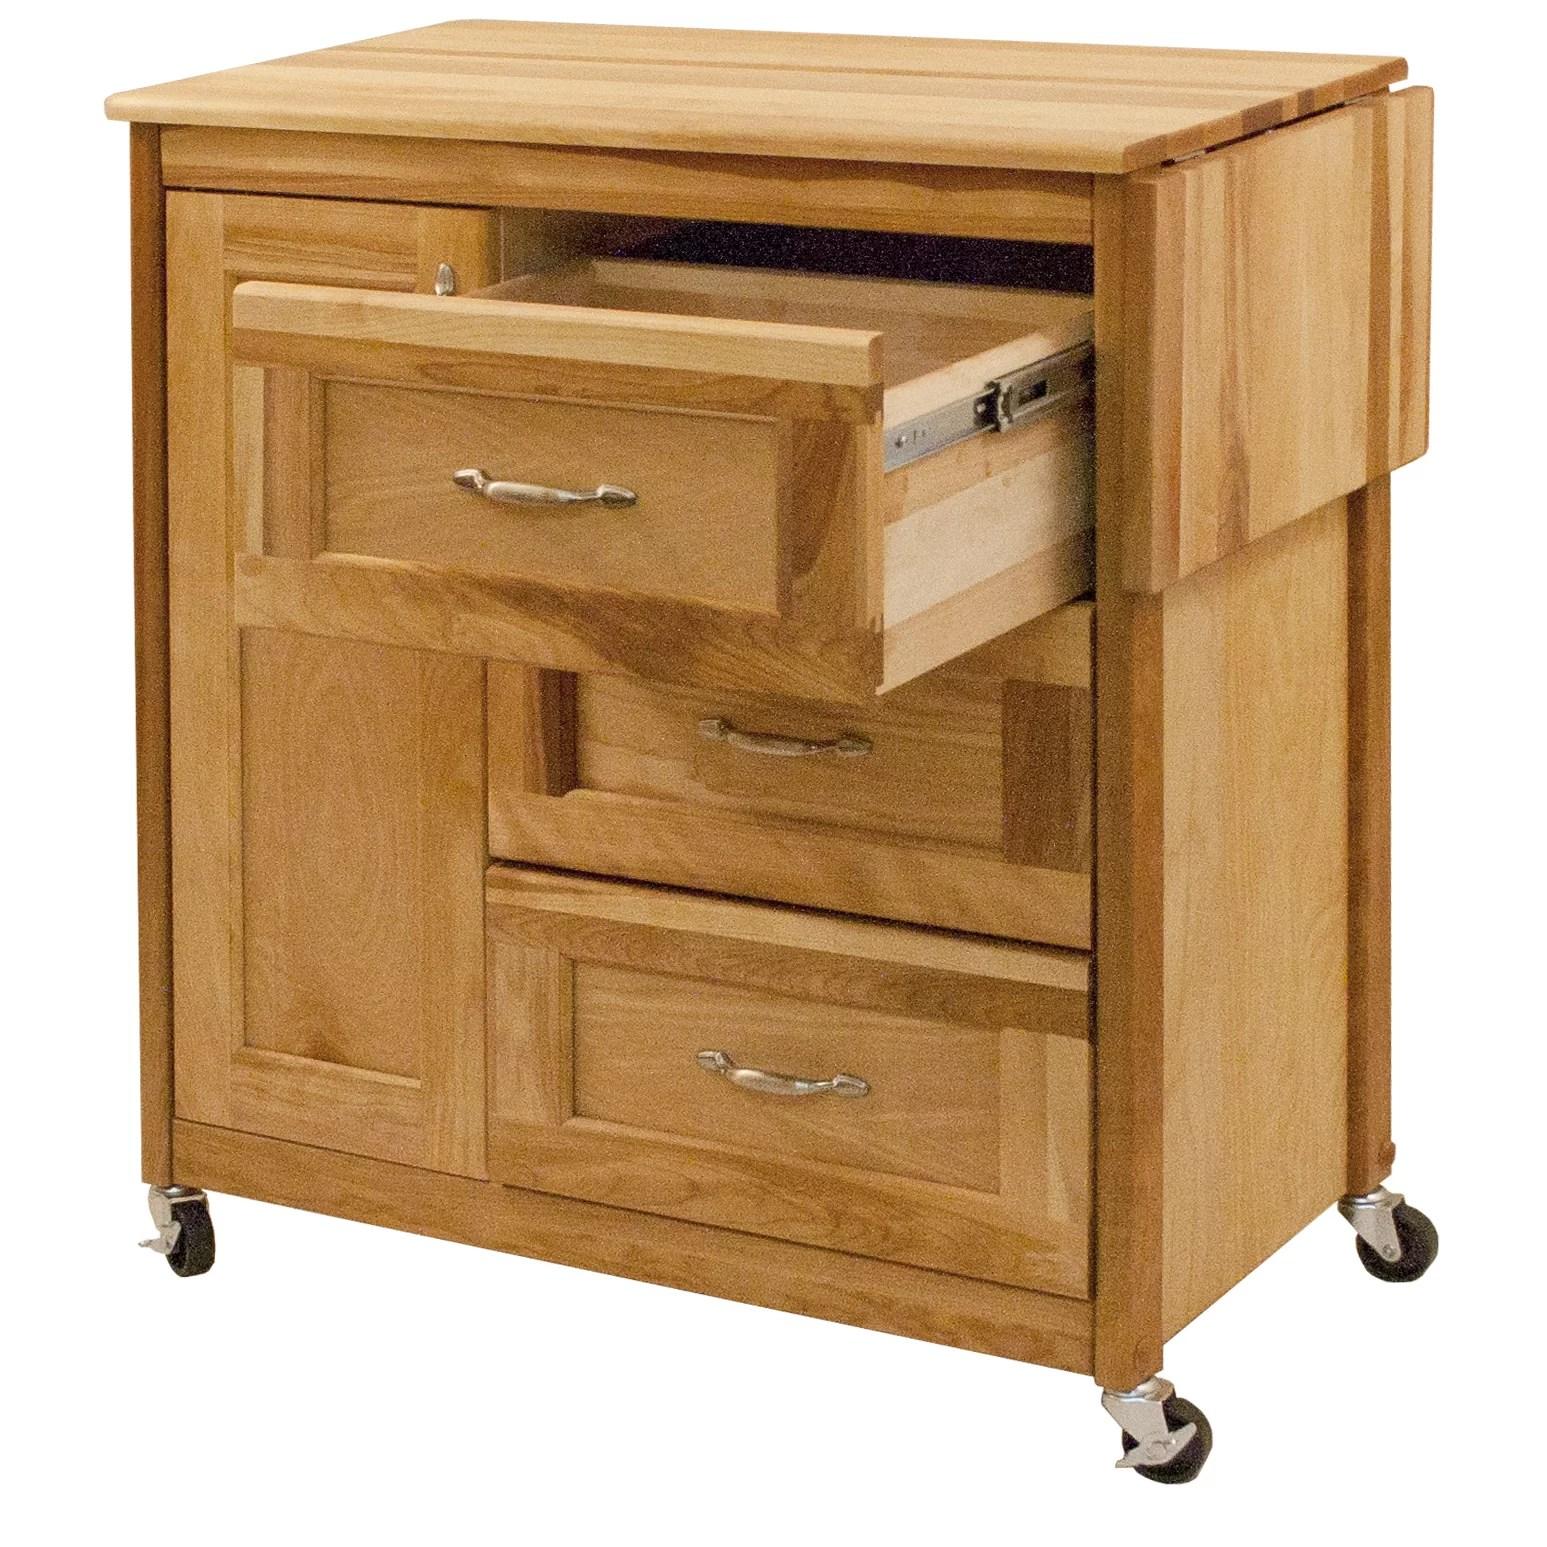 catskill craftsmen kitchen island office appliances cart wayfair